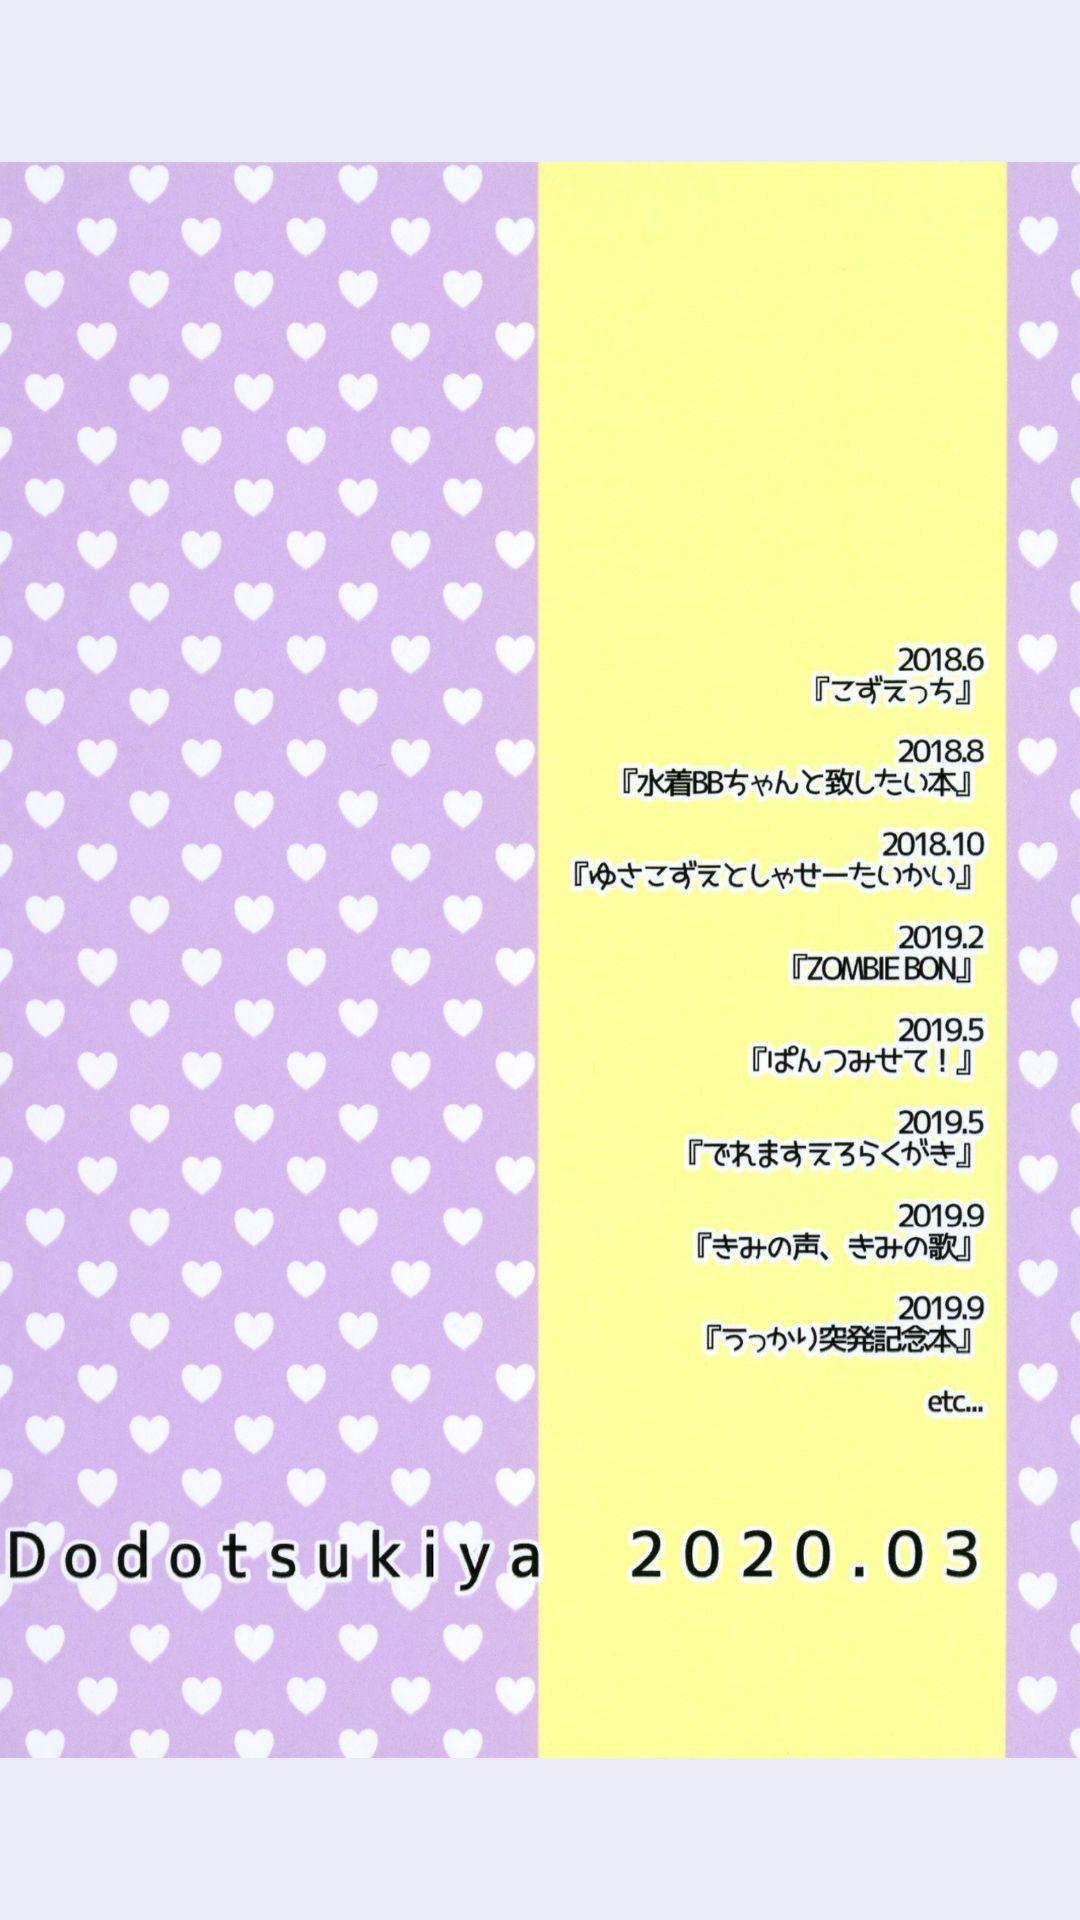 Dodotsukiya 2018-2019 Matome 79